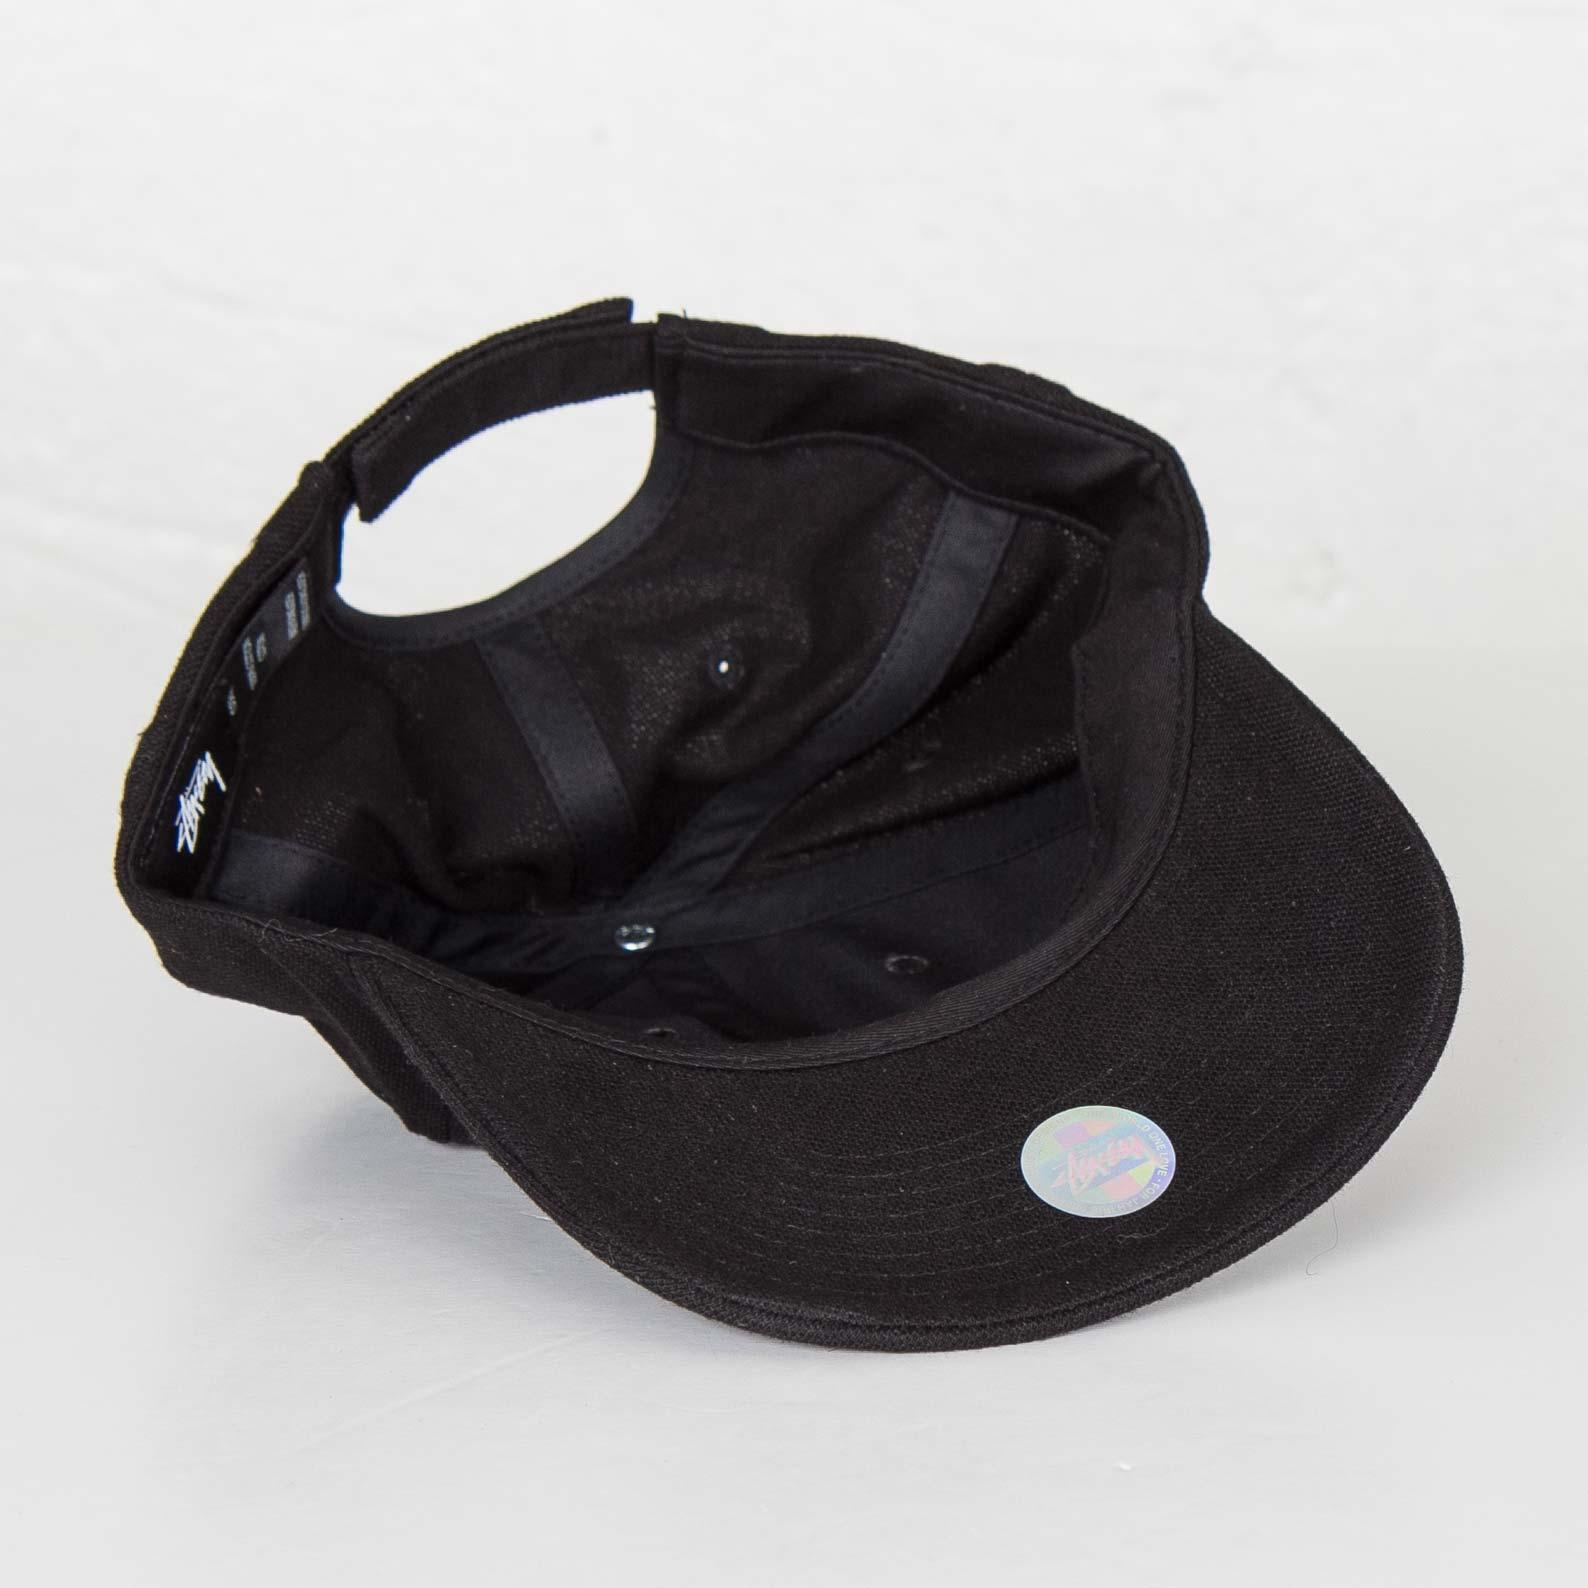 Stussy Stock Pique Cap - 131534-0001 - Sneakersnstuff  25bcc8145c3